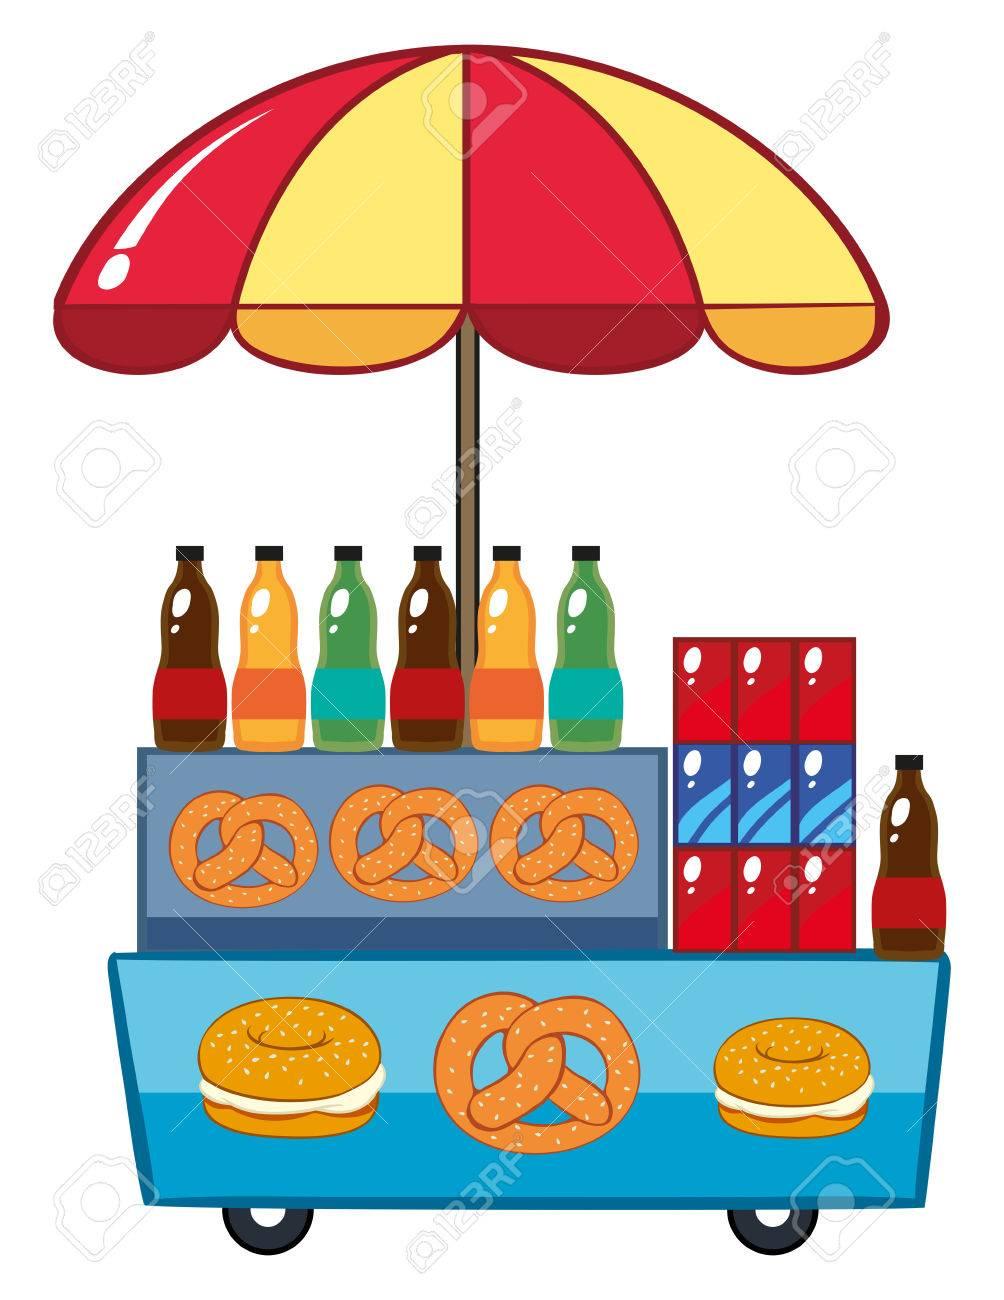 Food vendor with drinks and pretzle illustration.